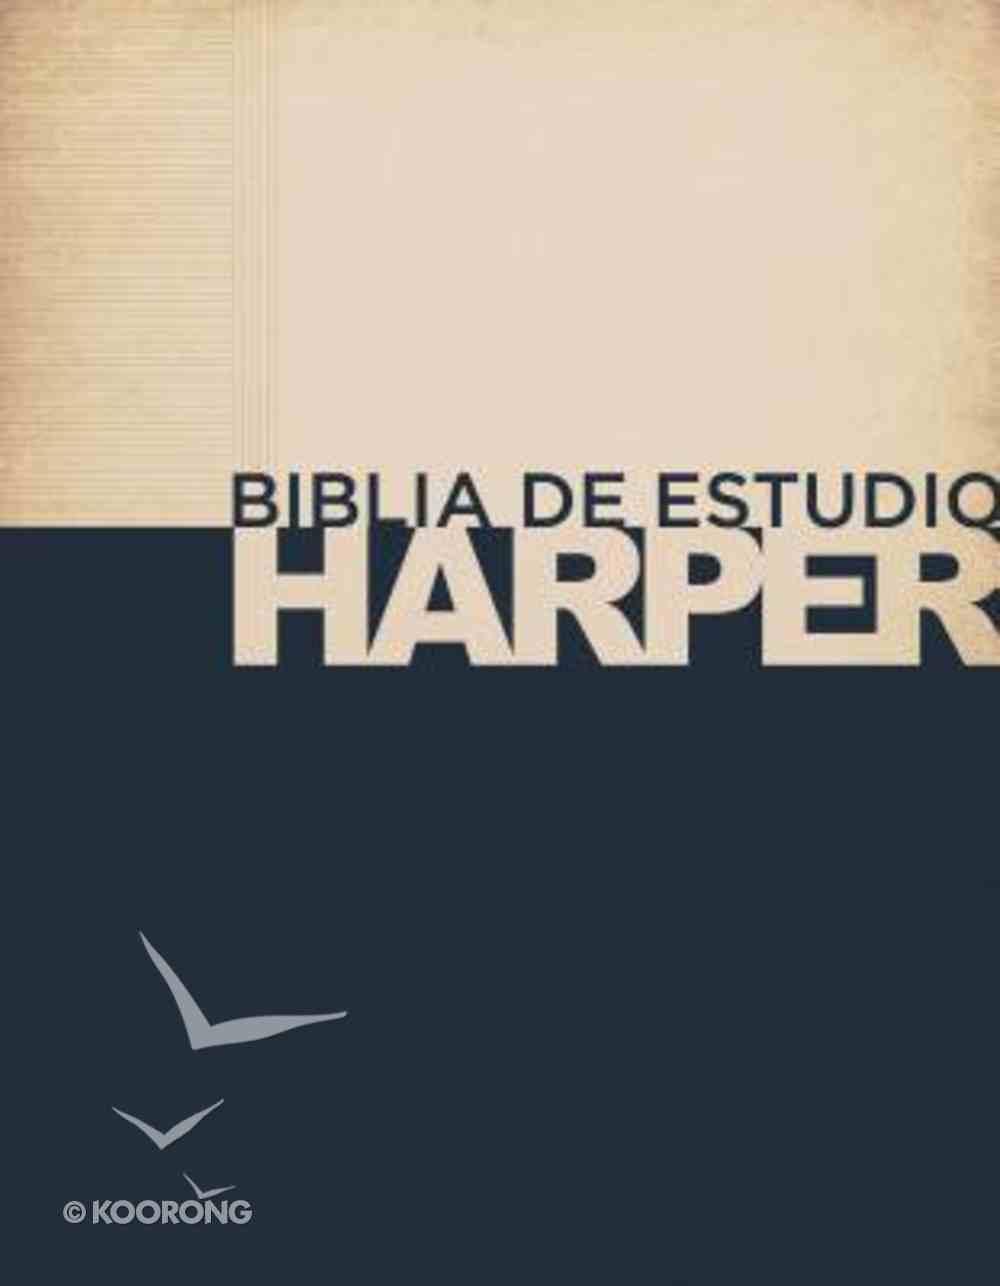 Rvr 1960 Biblia De Estudio Harper Tapa Dura Con Ndice (Spanish) Hardback